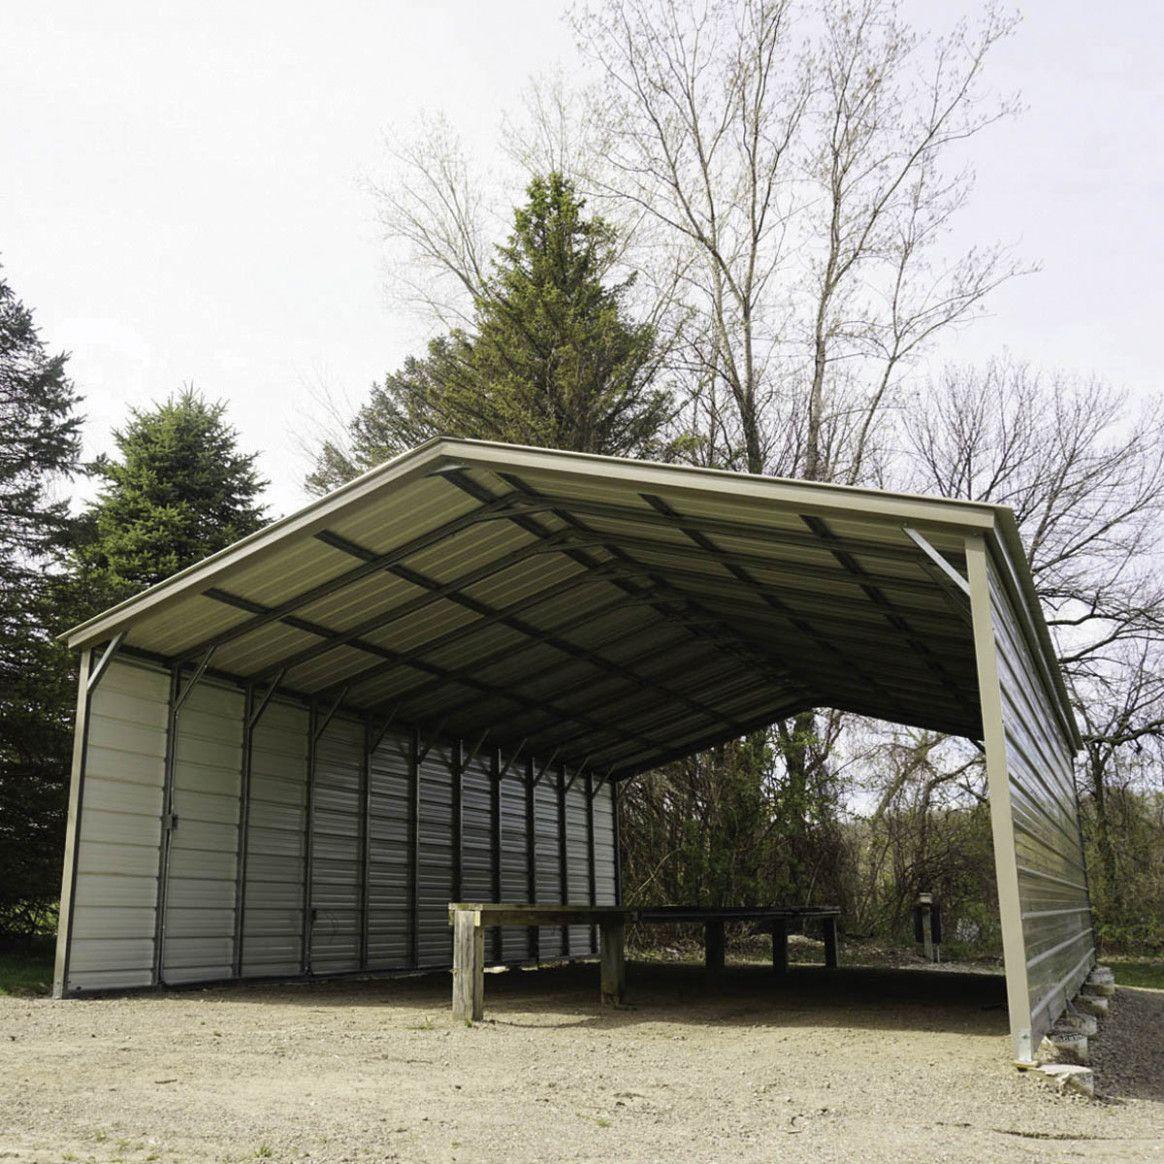 Carport Canopy Metal in 2020 Steel carports, Carport